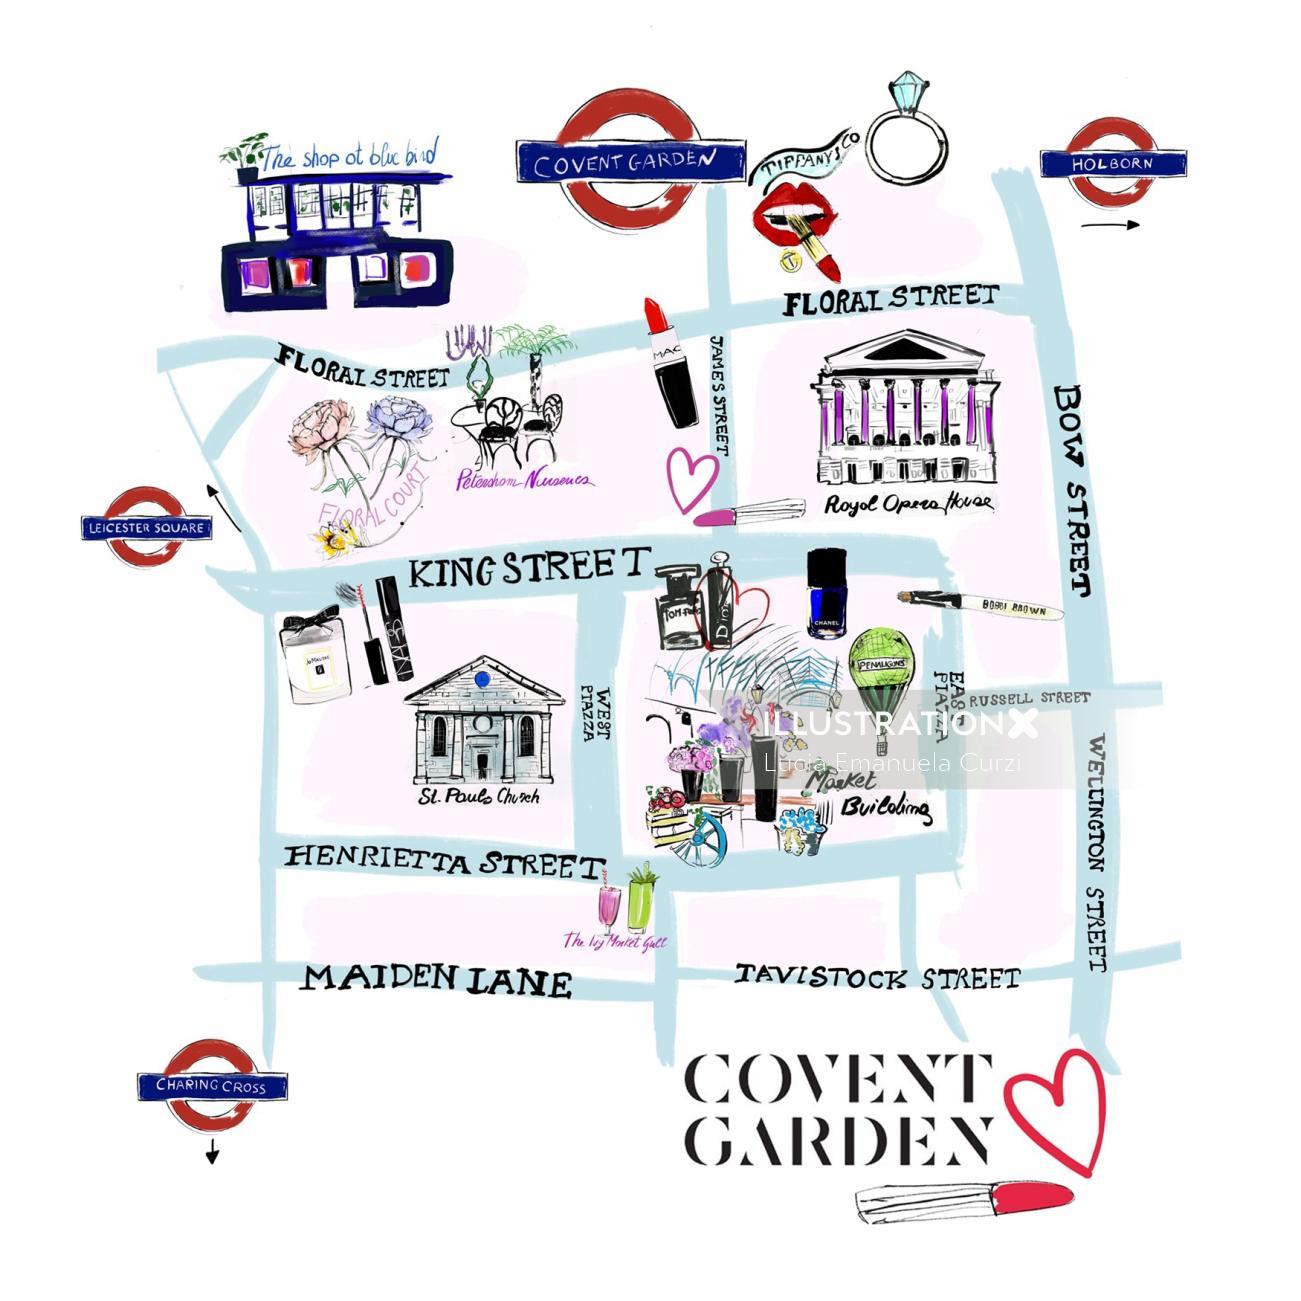 Maps Covent Garden street view